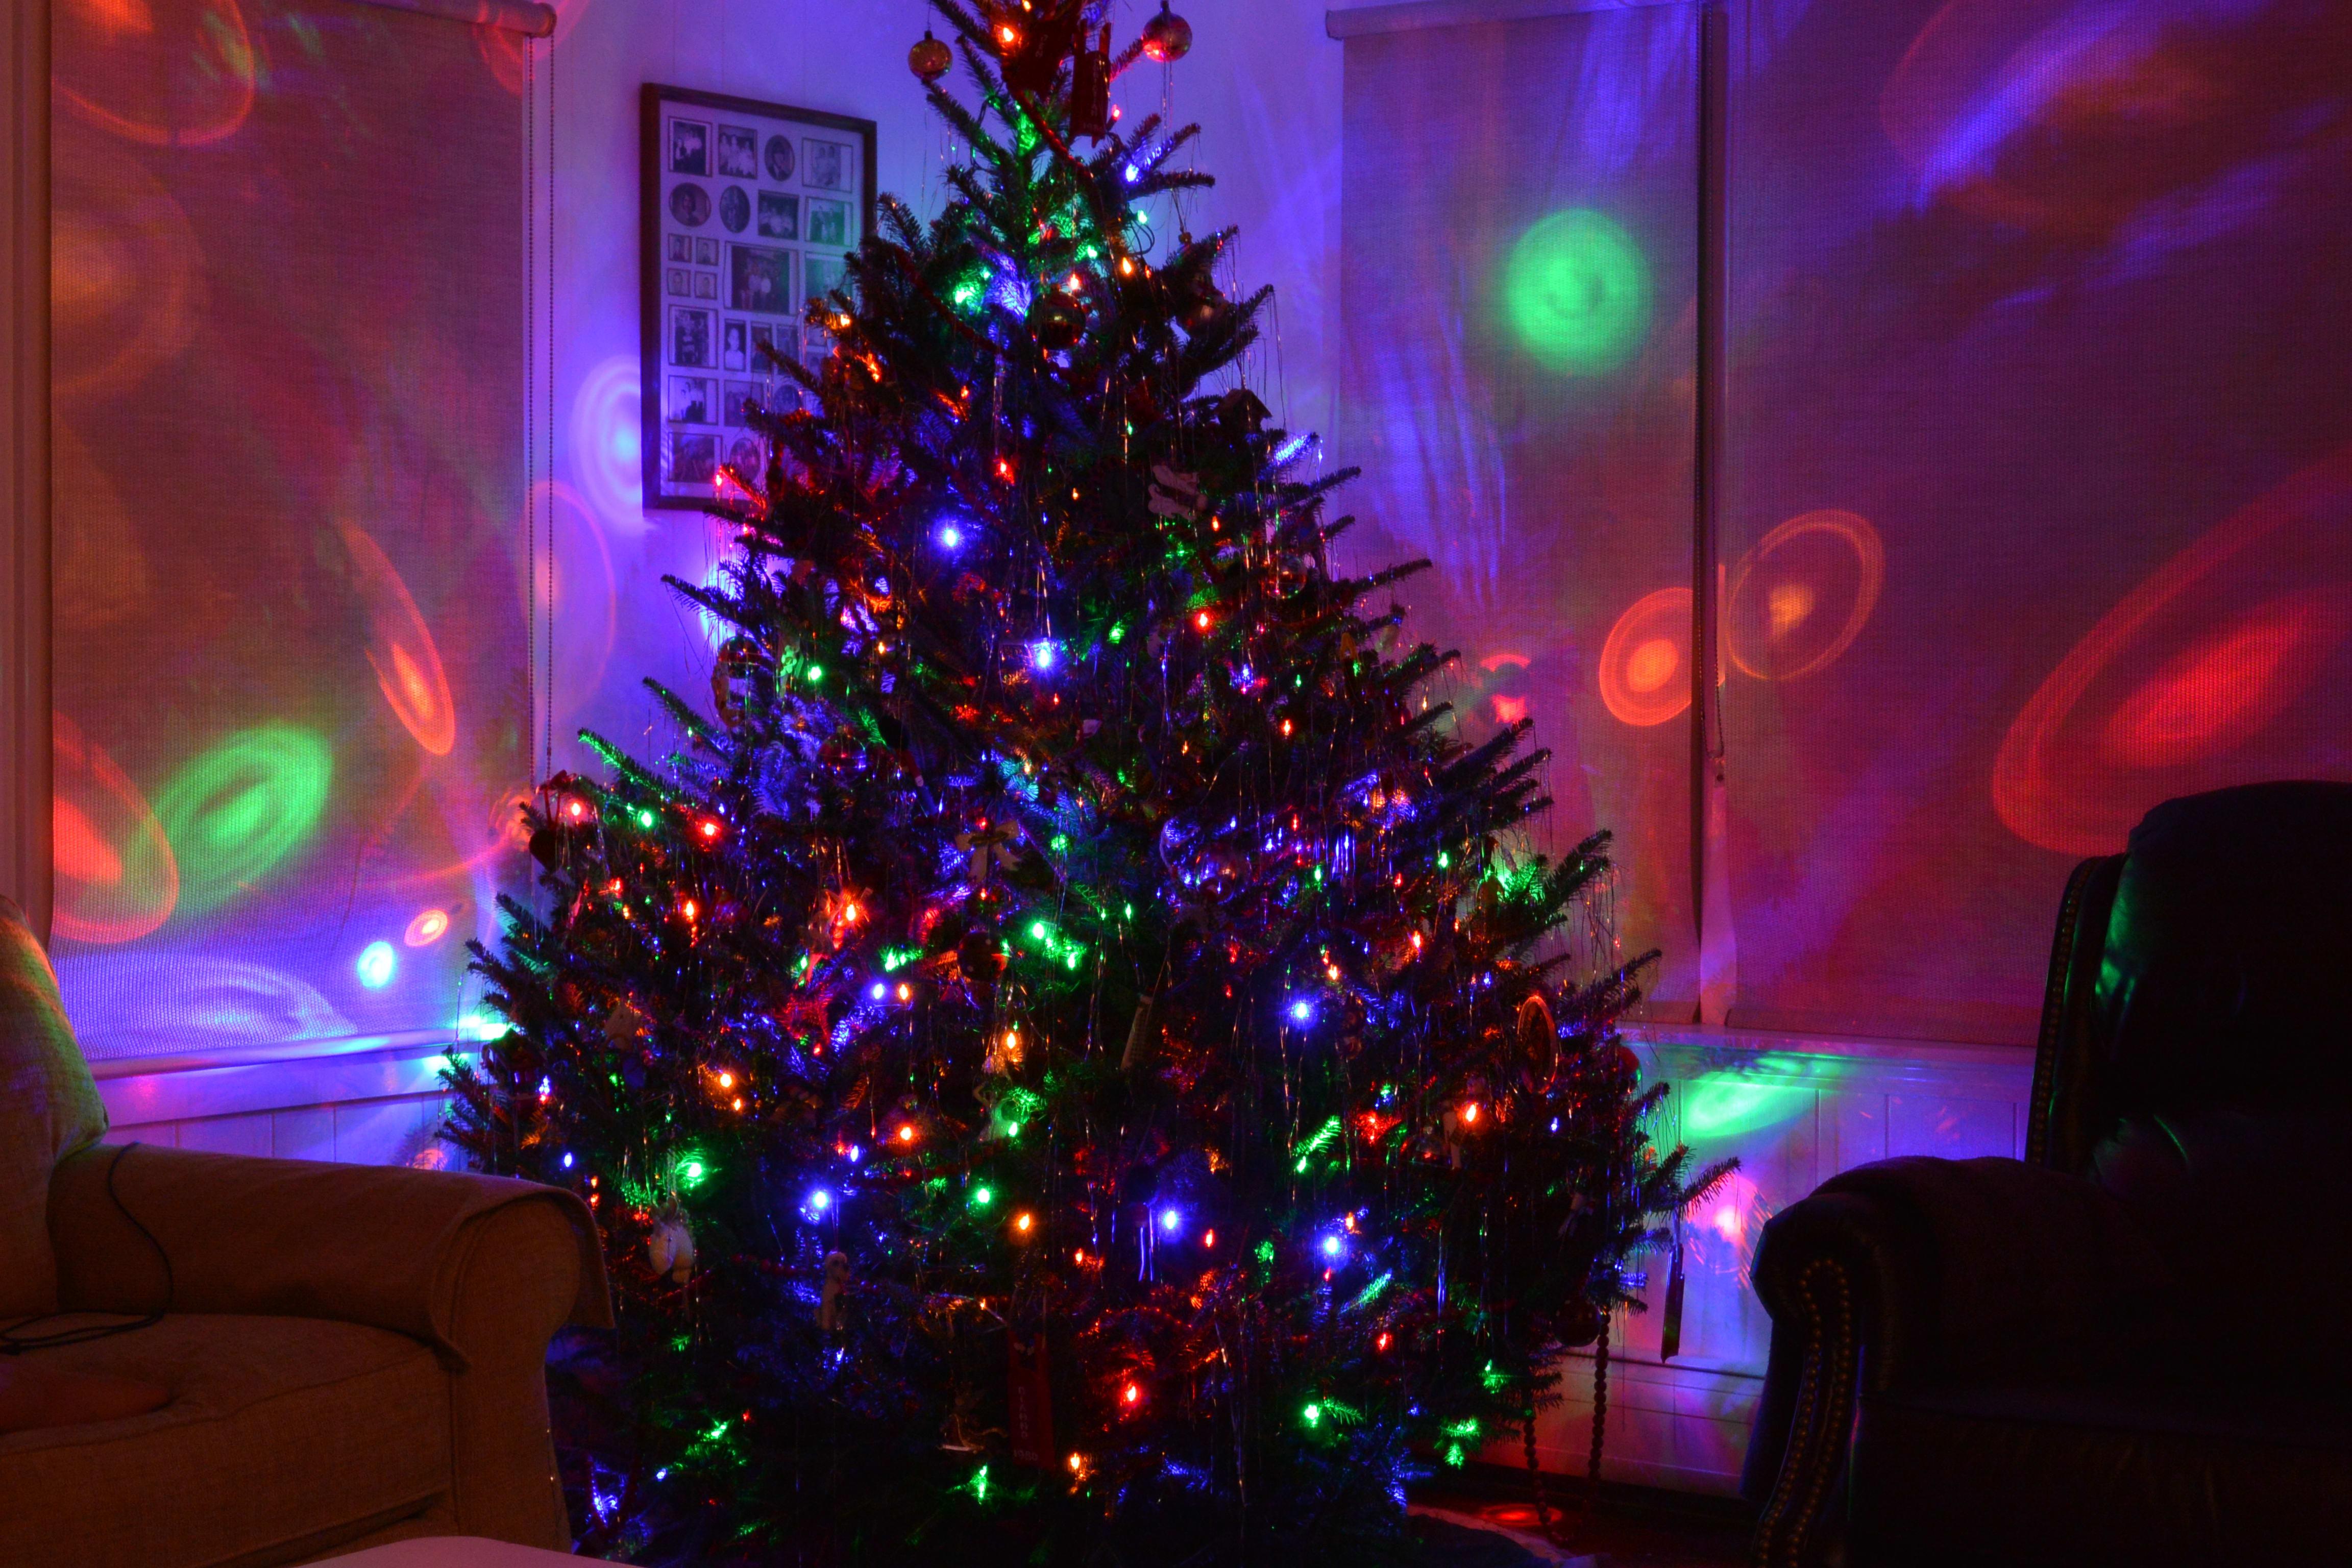 Sample photo, Nikon 1 AW1: Christmas tree